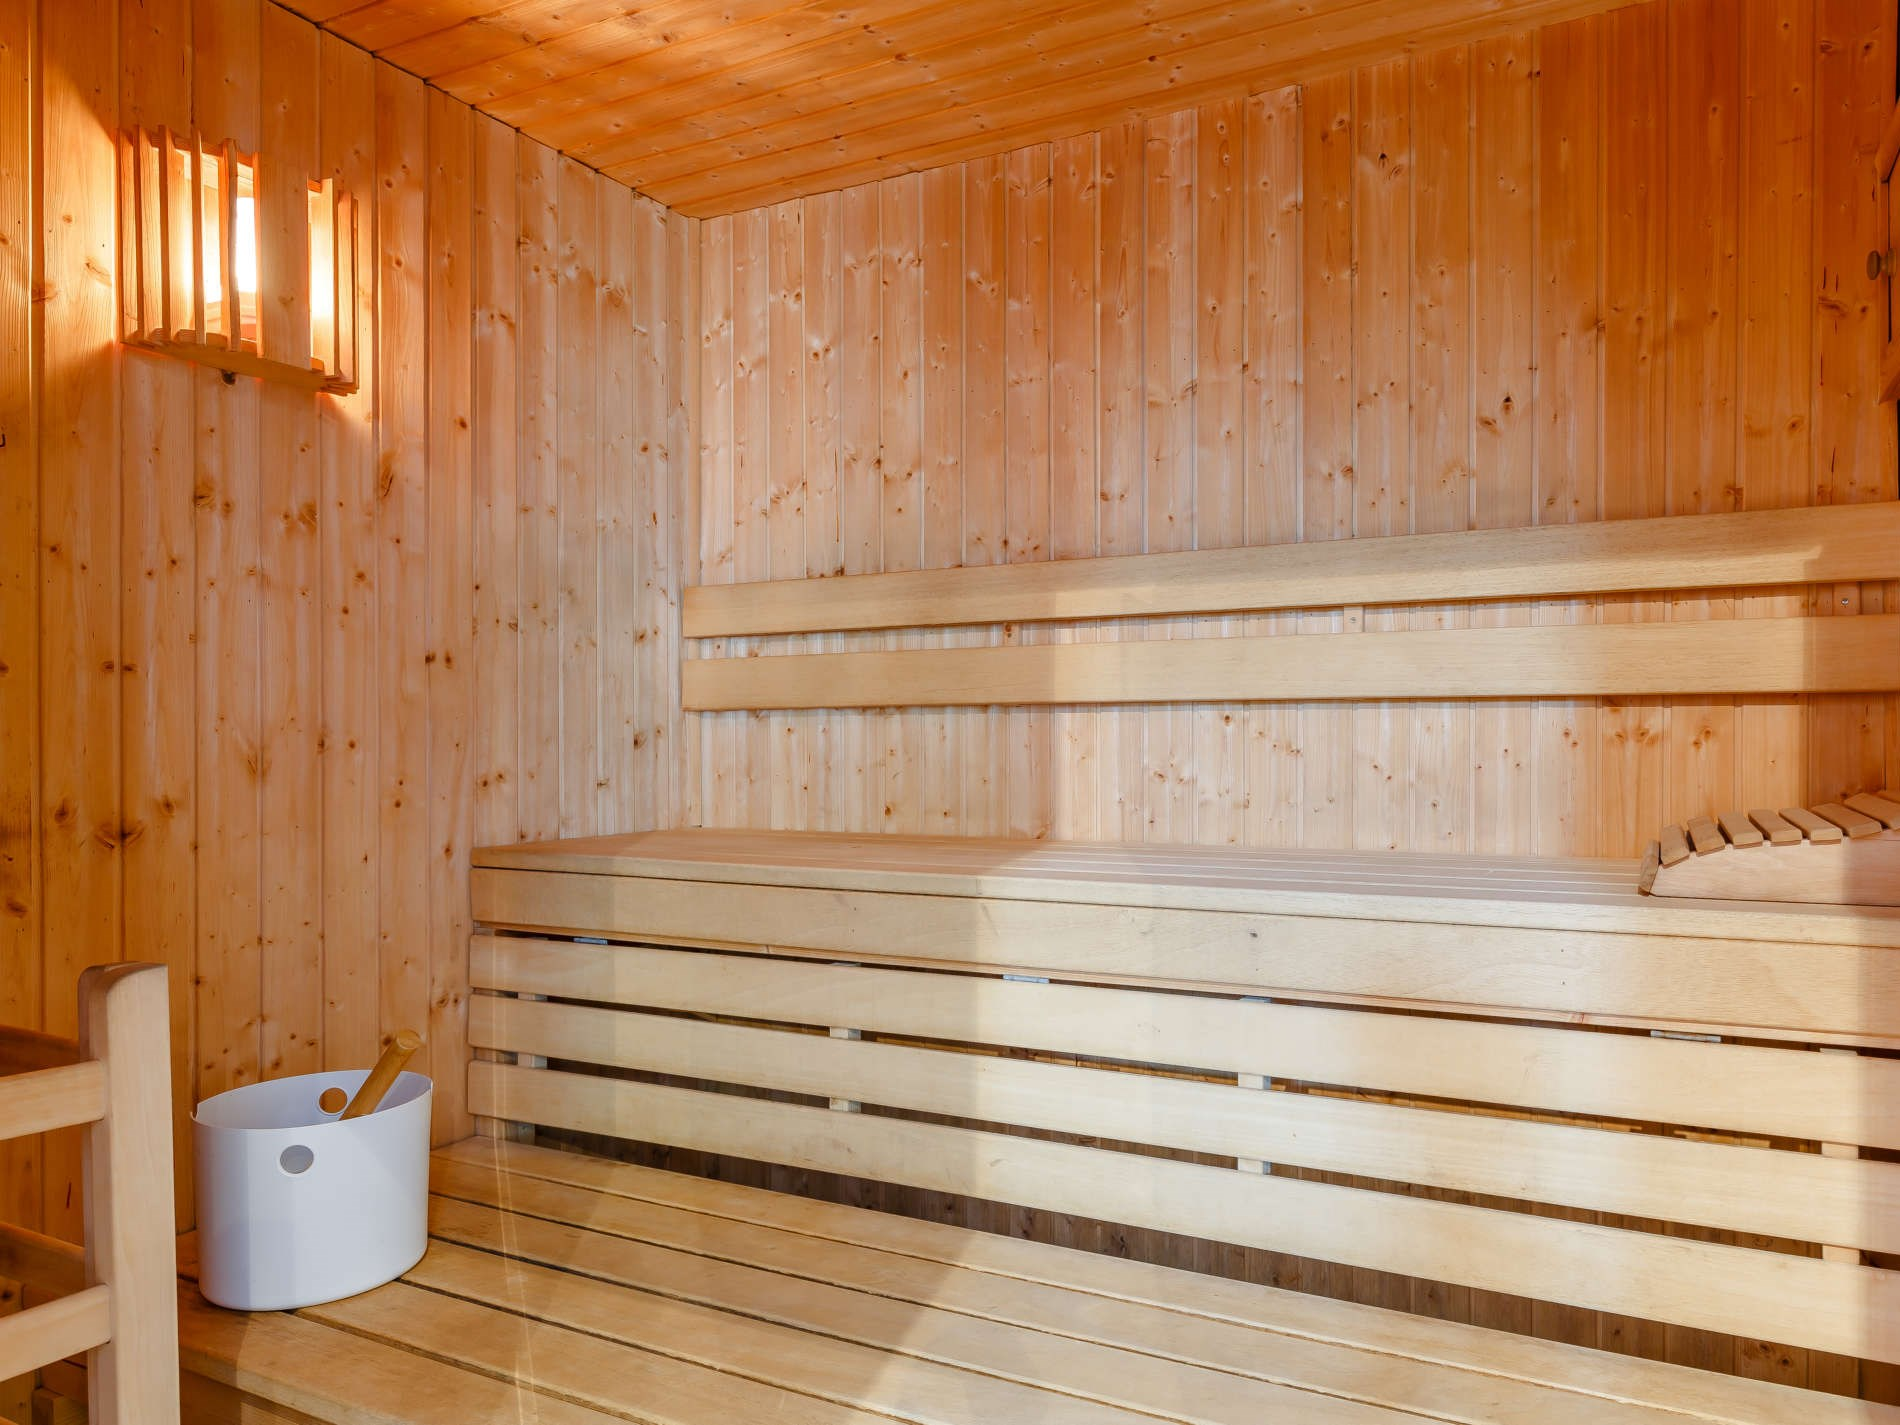 3 Bedroom Barn in South Cornwall, Cornwall